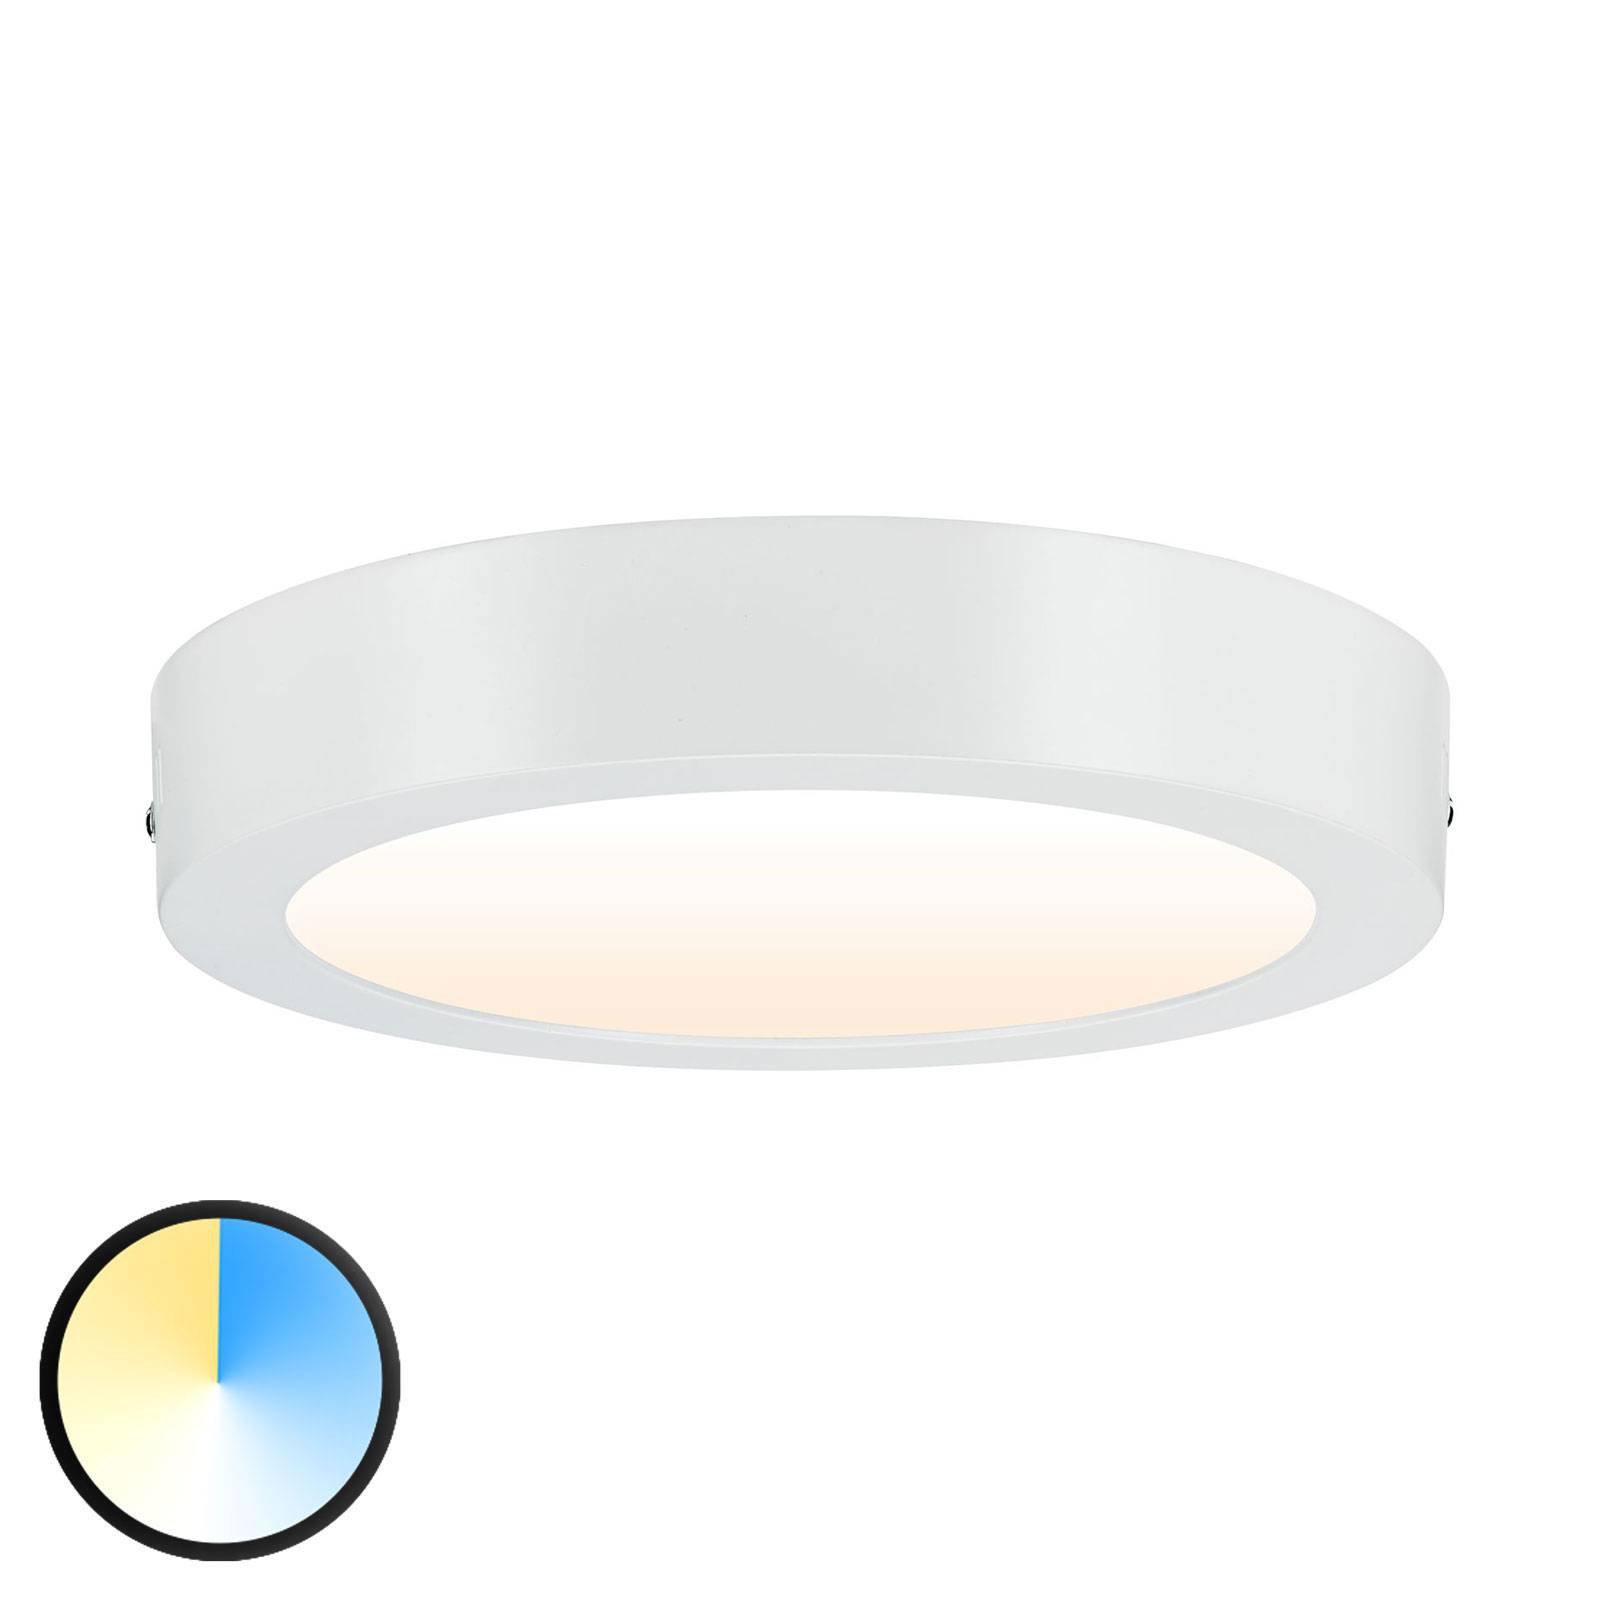 Paulmann Carpo LED-taklampe rund hvit 22,5 cm